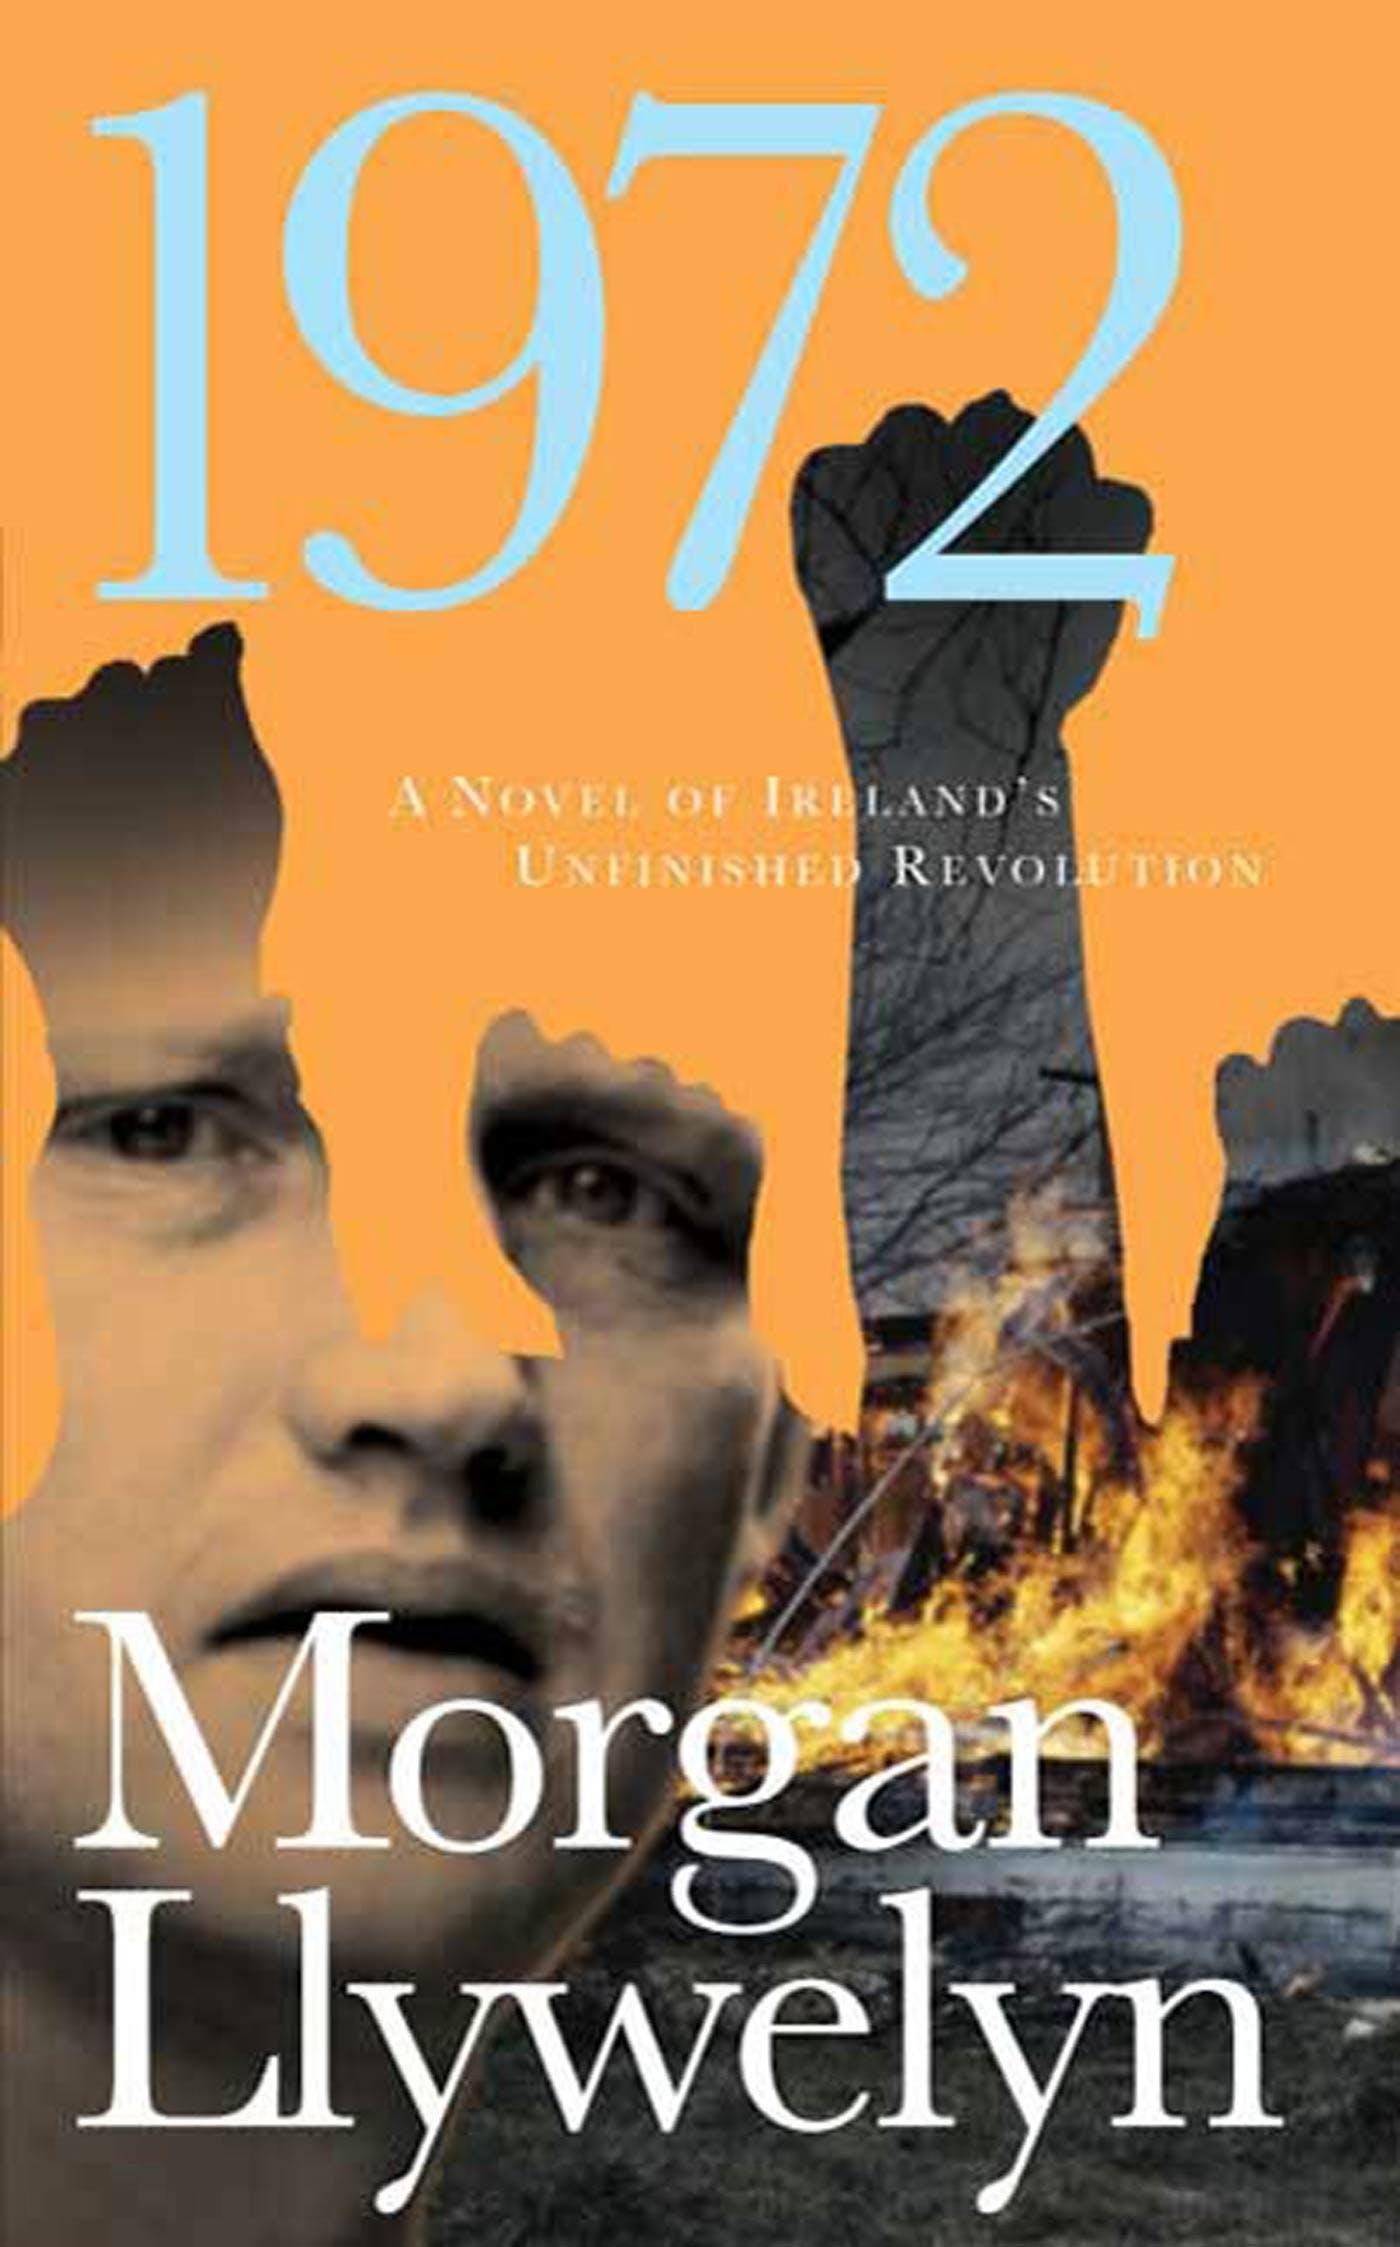 Image of 1972: A Novel of Ireland's Unfinished Revolution